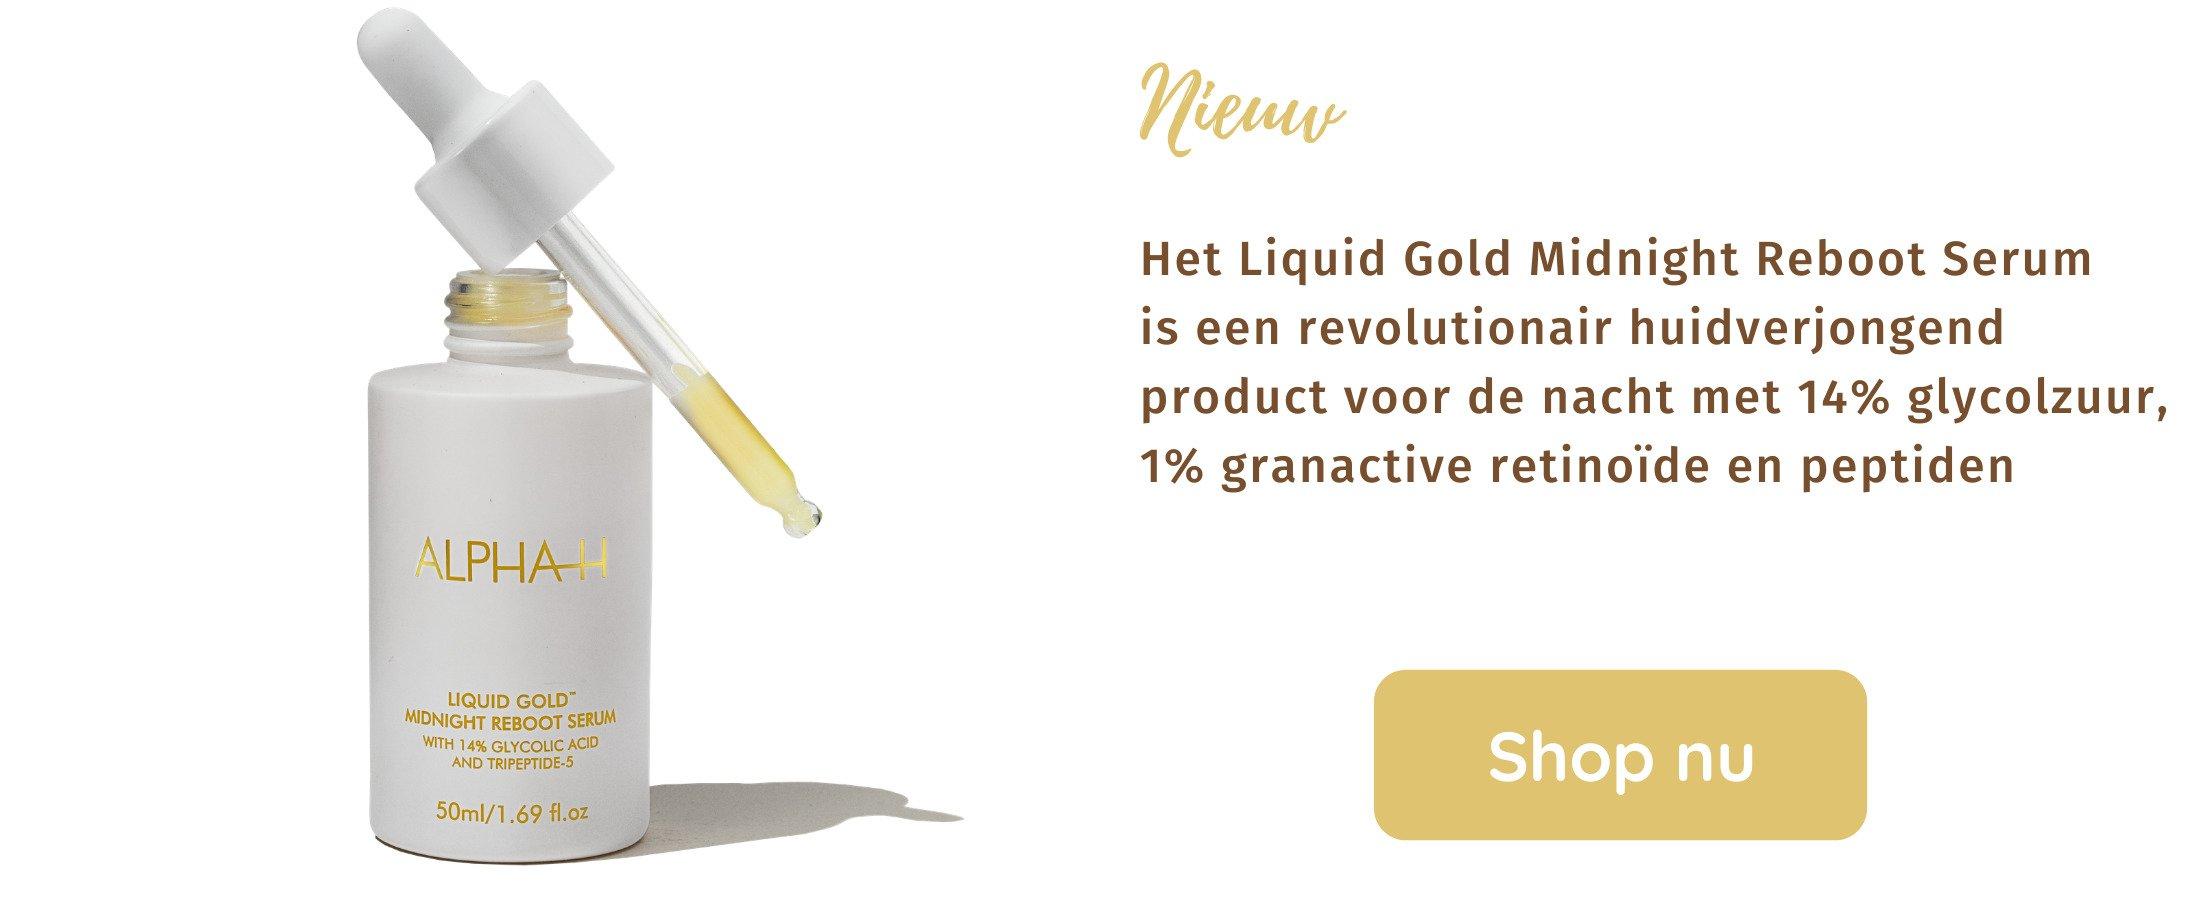 Liquid Gold Midnight Reboot Serum